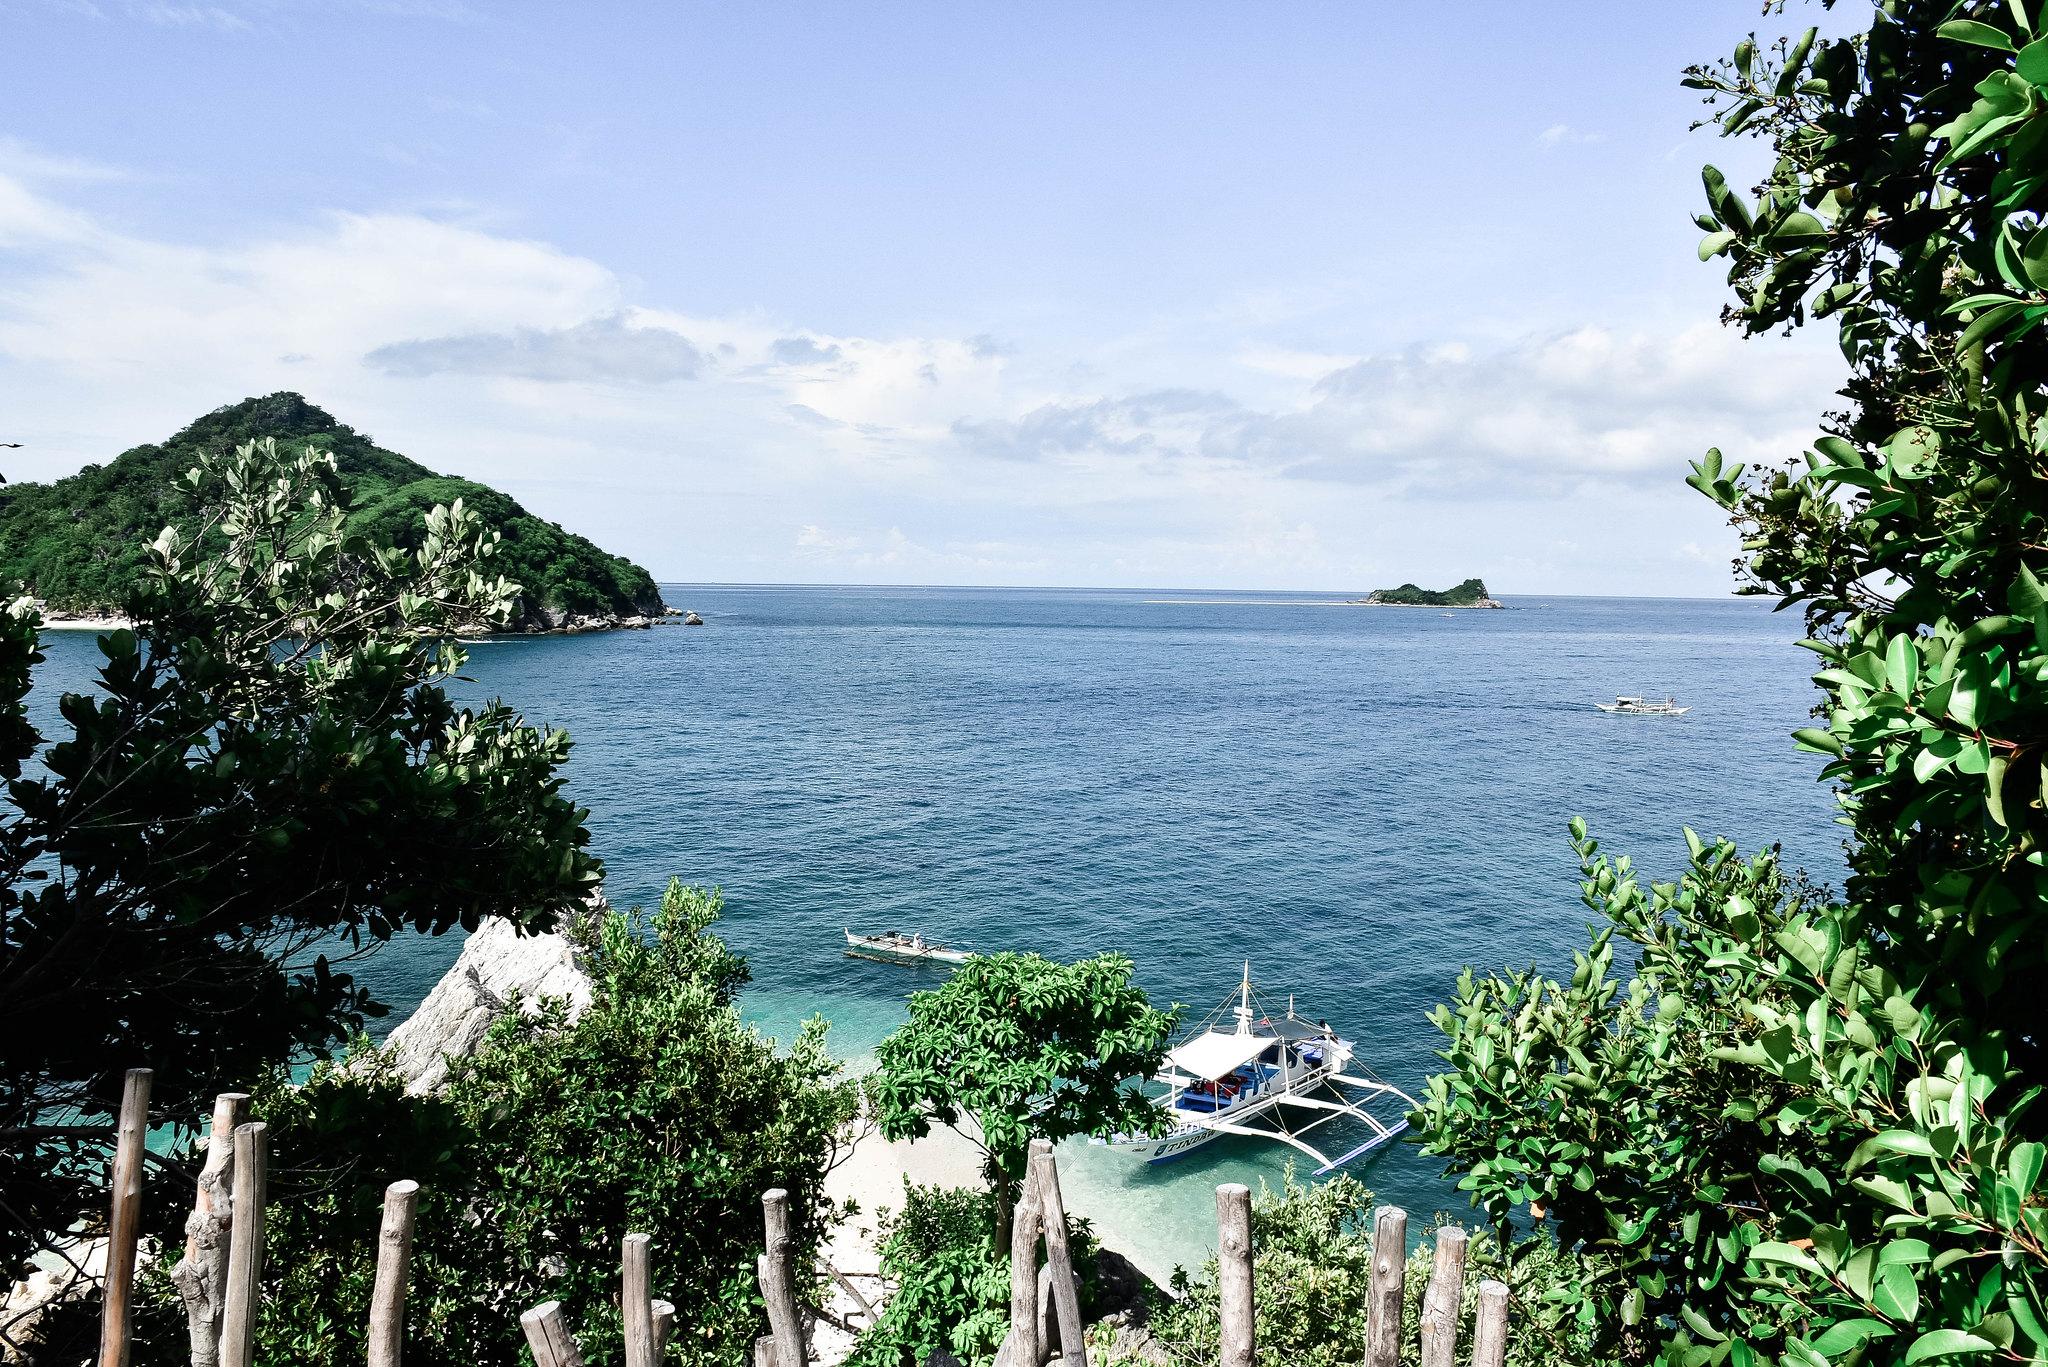 Cabugaw Gamay island 7 (1 of 1)